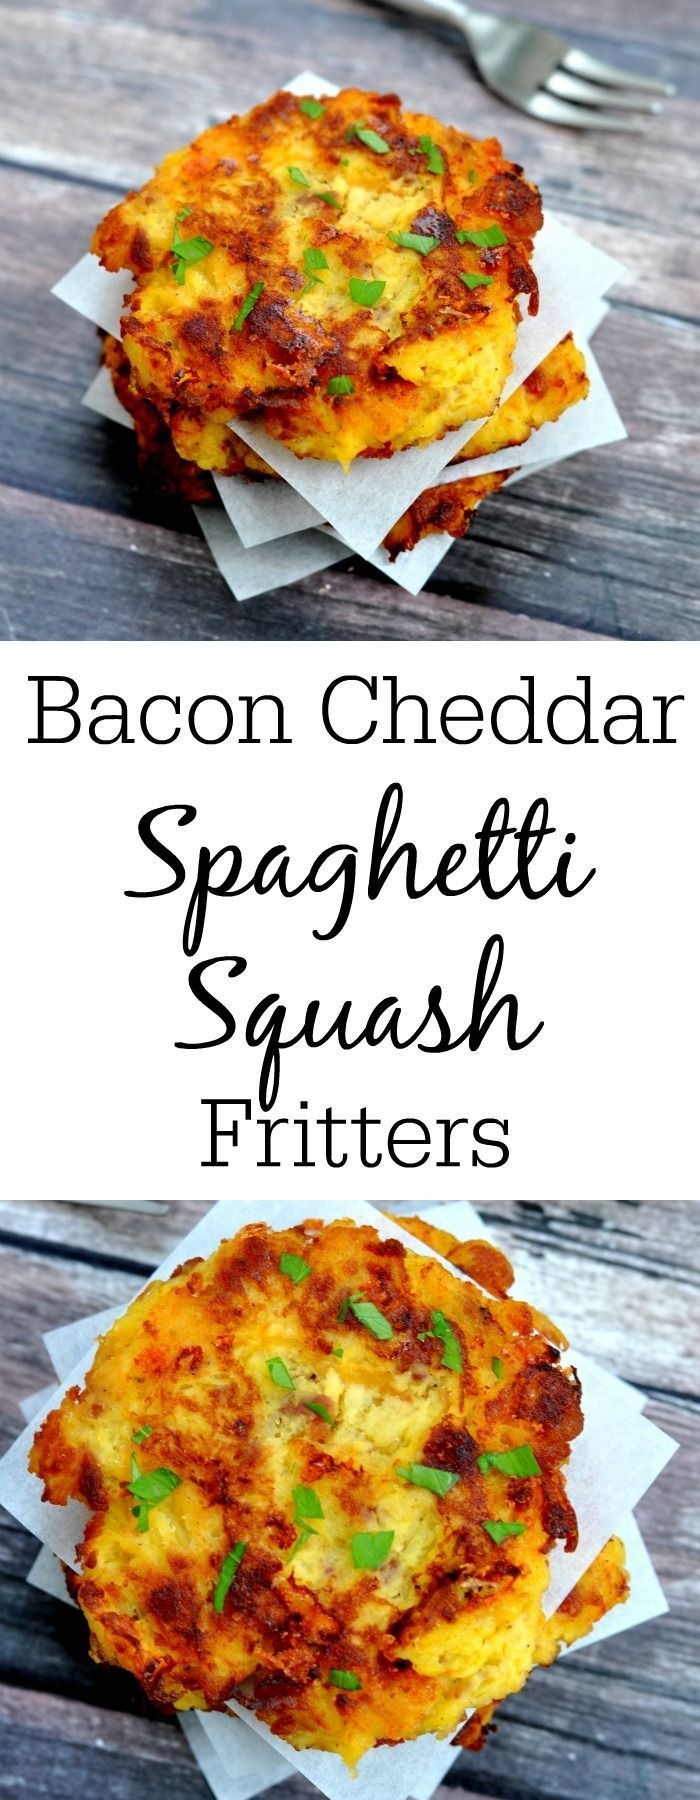 Bacon Spaghetti Squash Fritters - My Suburban Kitchen